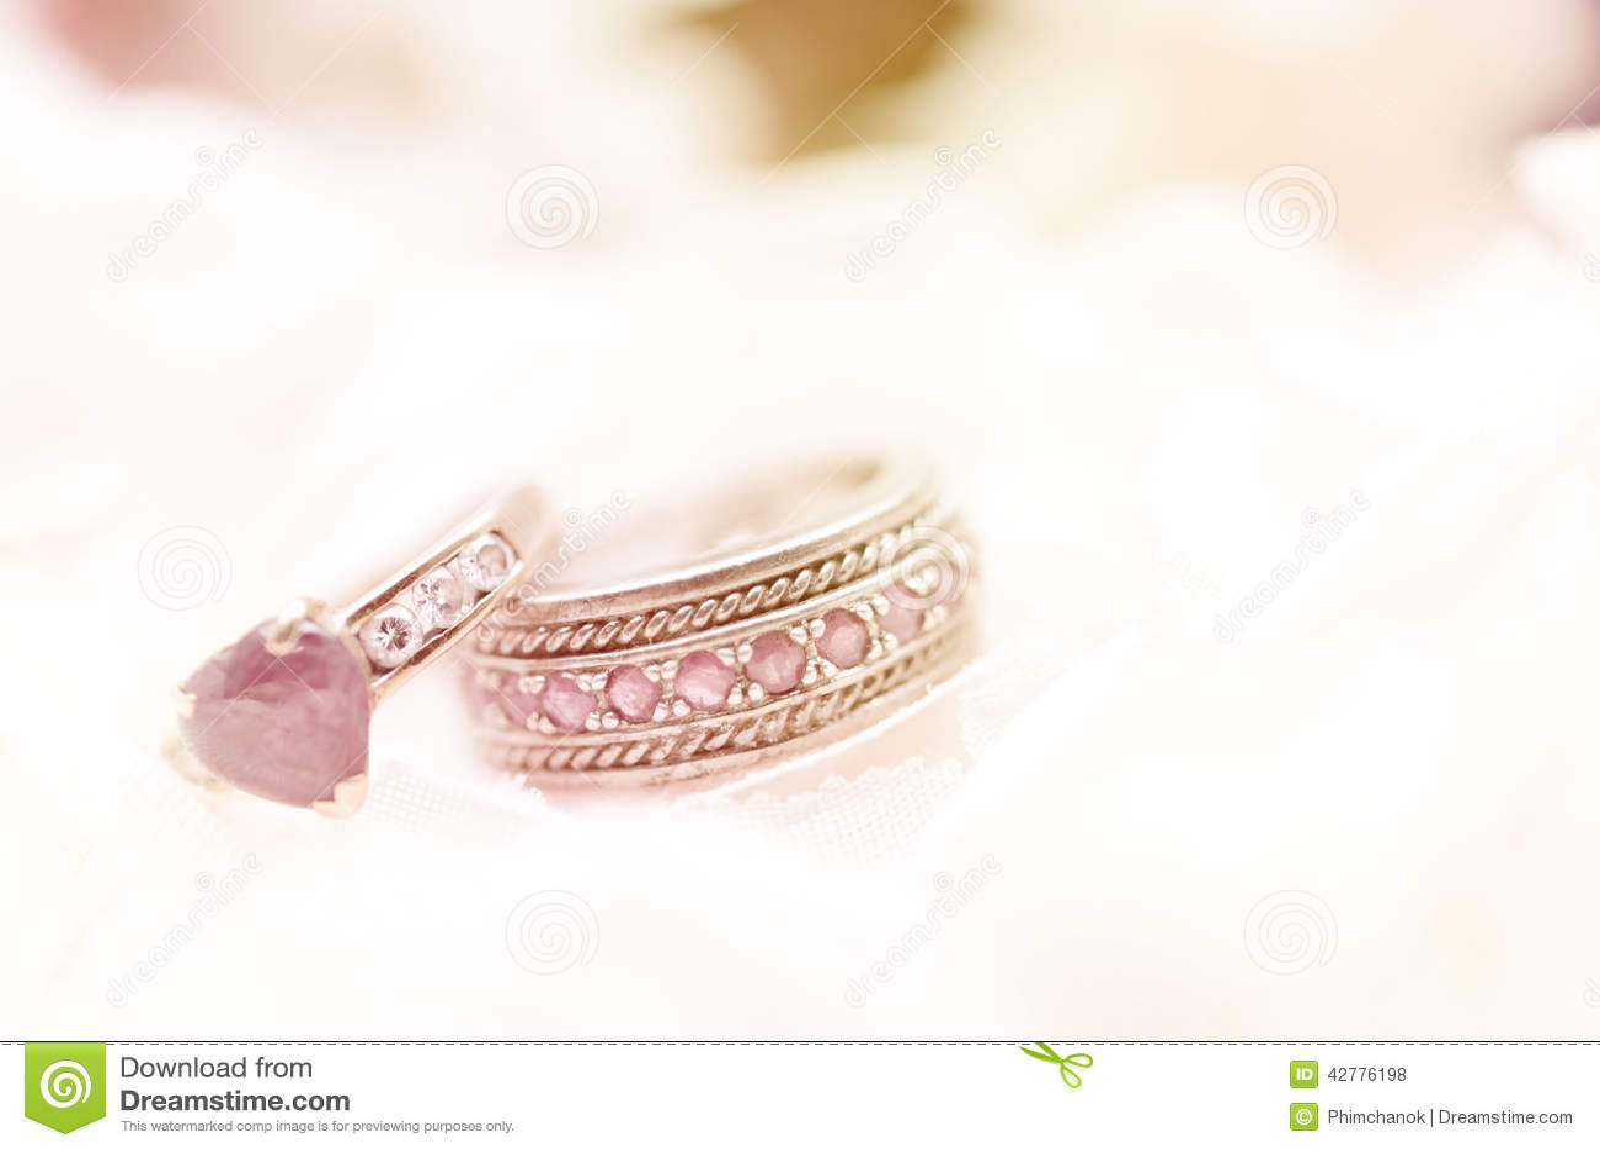 Seamless Romantic Background Stock Photo - Image: 42776198